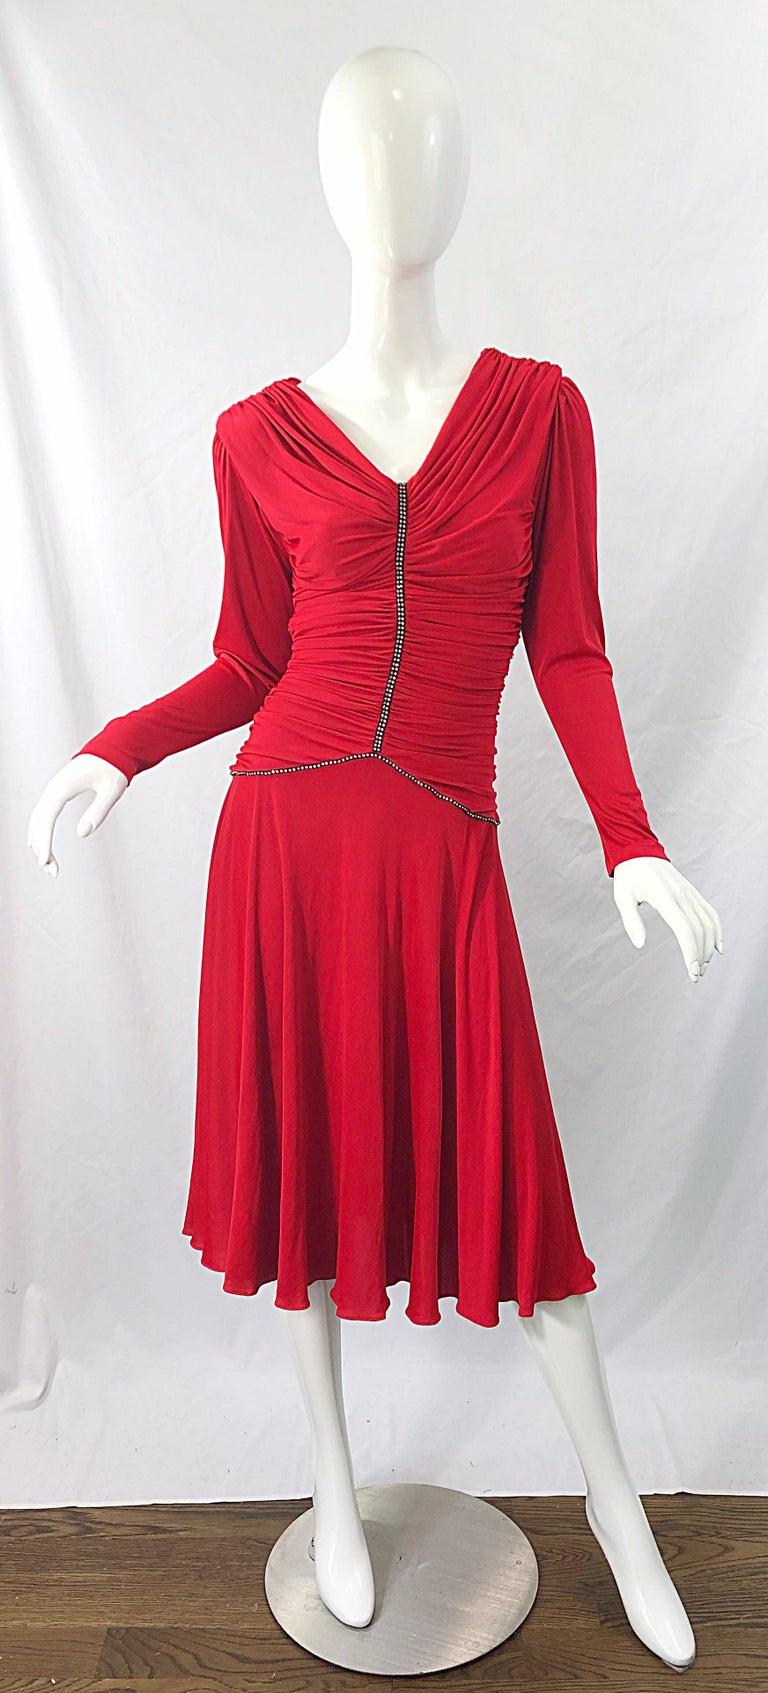 1970s Claraluna Original Lipstick Red Rhinestone Slinky Jersey Vintage 70s Dress For Sale 9